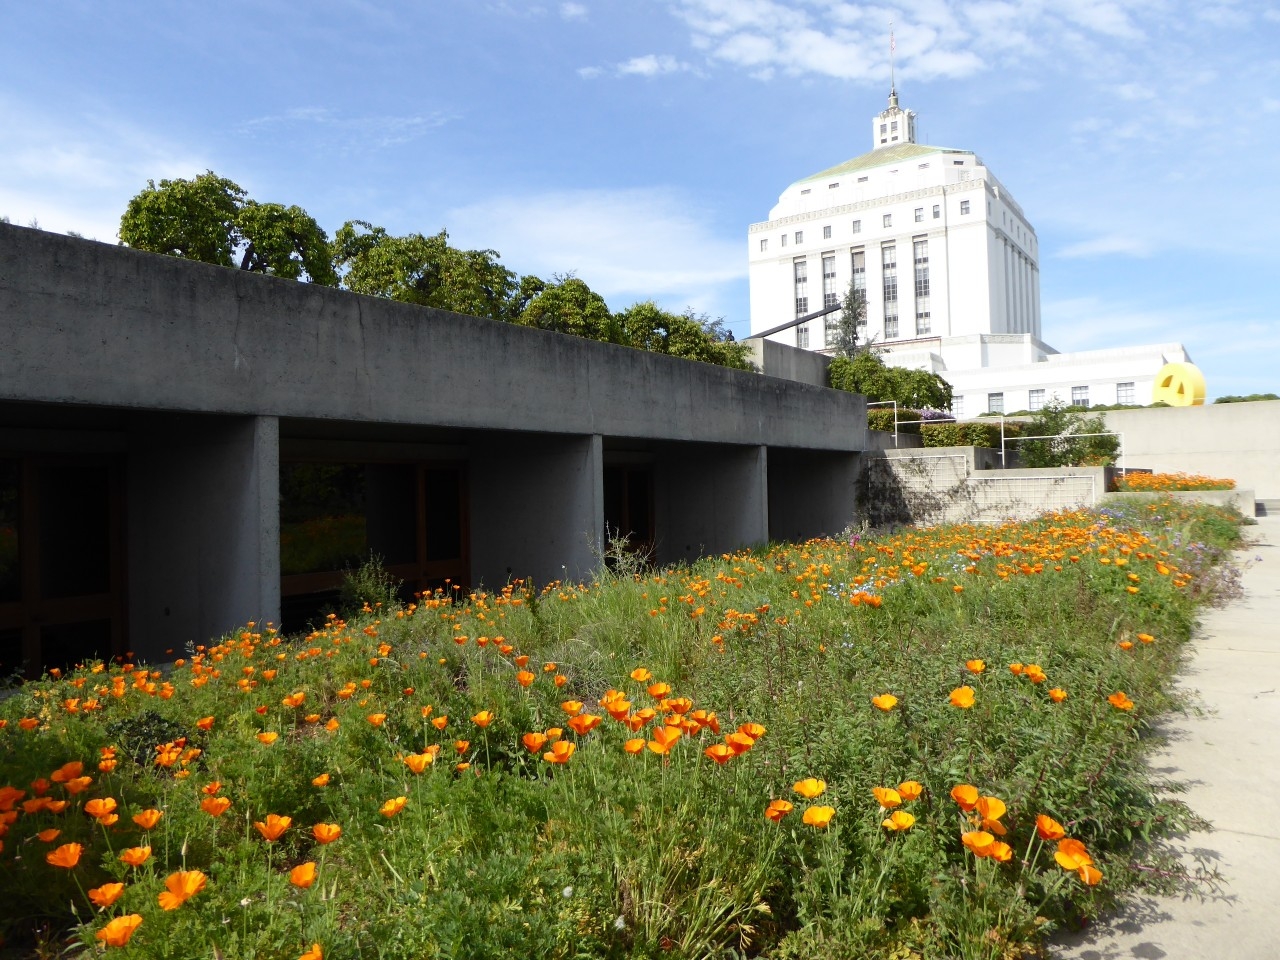 Upper terrace + California Poppies